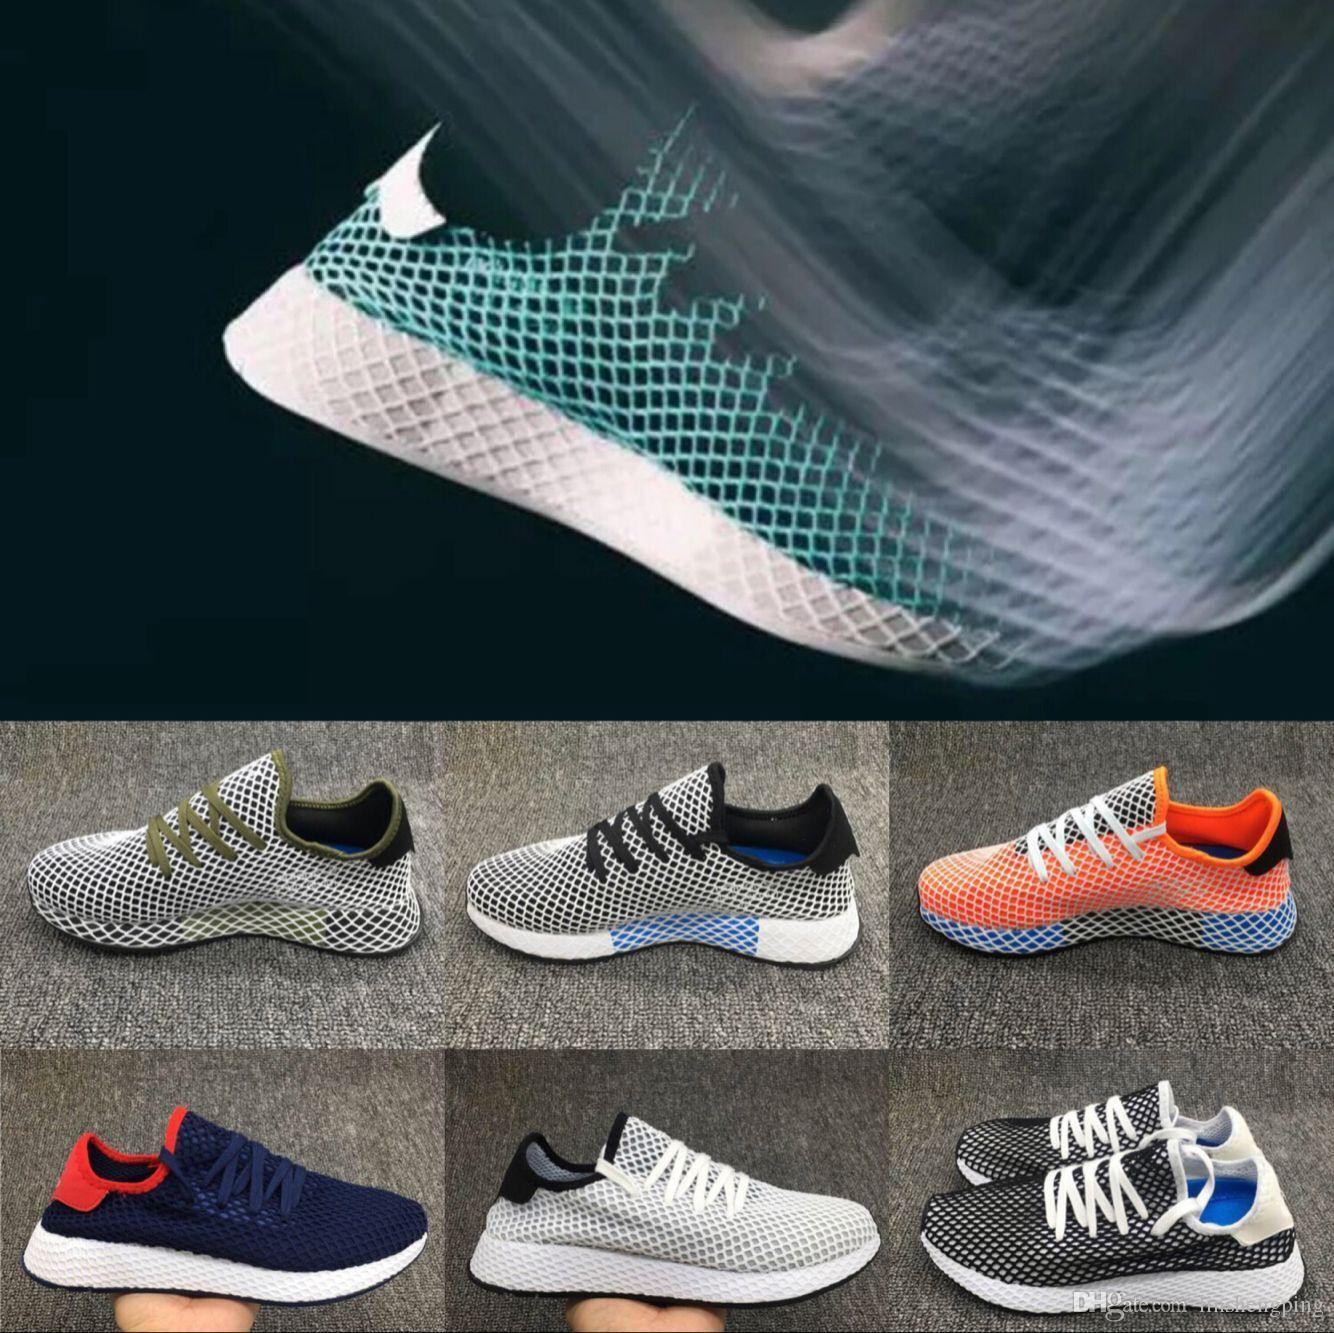 886d8f5c3ac35 2018 SALE New DEERUPT RUNNER Shoes Mans Womens Running Shoes Sneakers  Deerupts Sports Trainers Shoe For Women CQ2624 CQ2625 CQ2626 CQ2910 Trail  Running ...